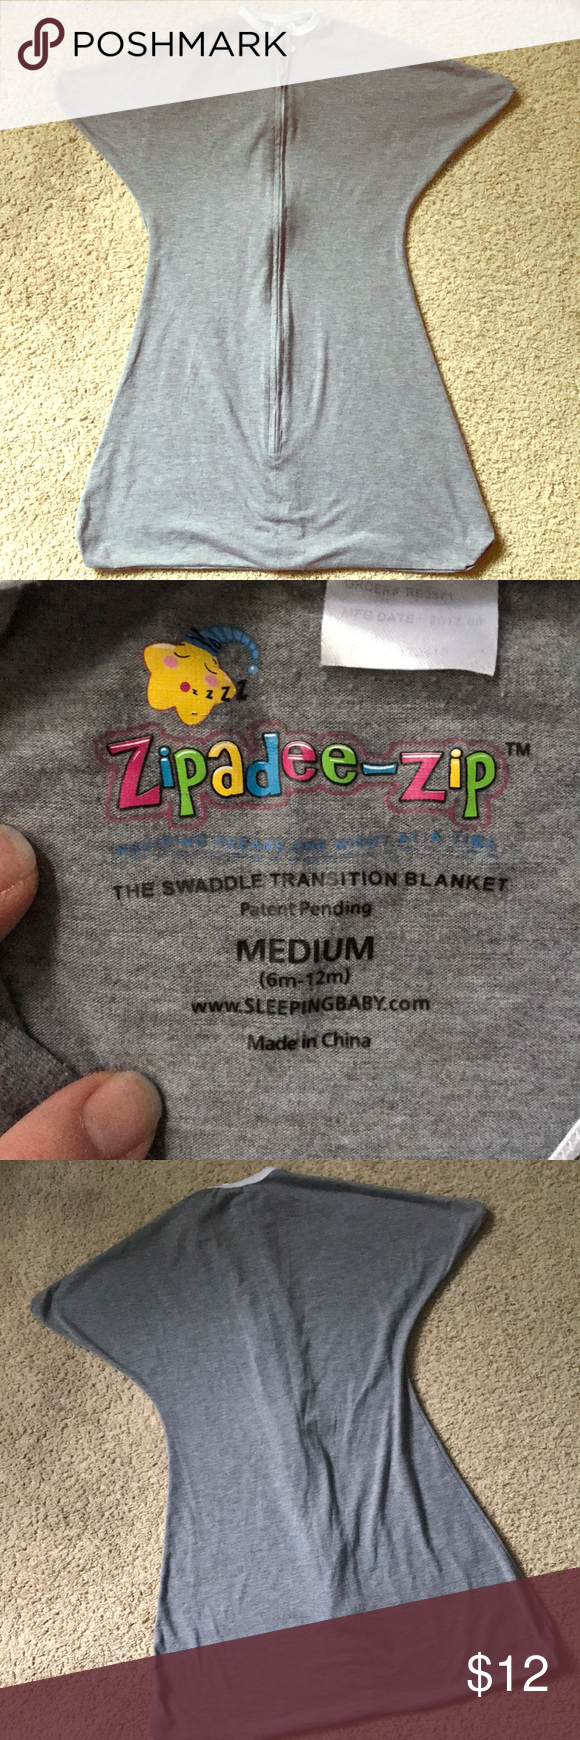 Zipadeezip size medium (6m12m) grey Medium, Zip, Fashion